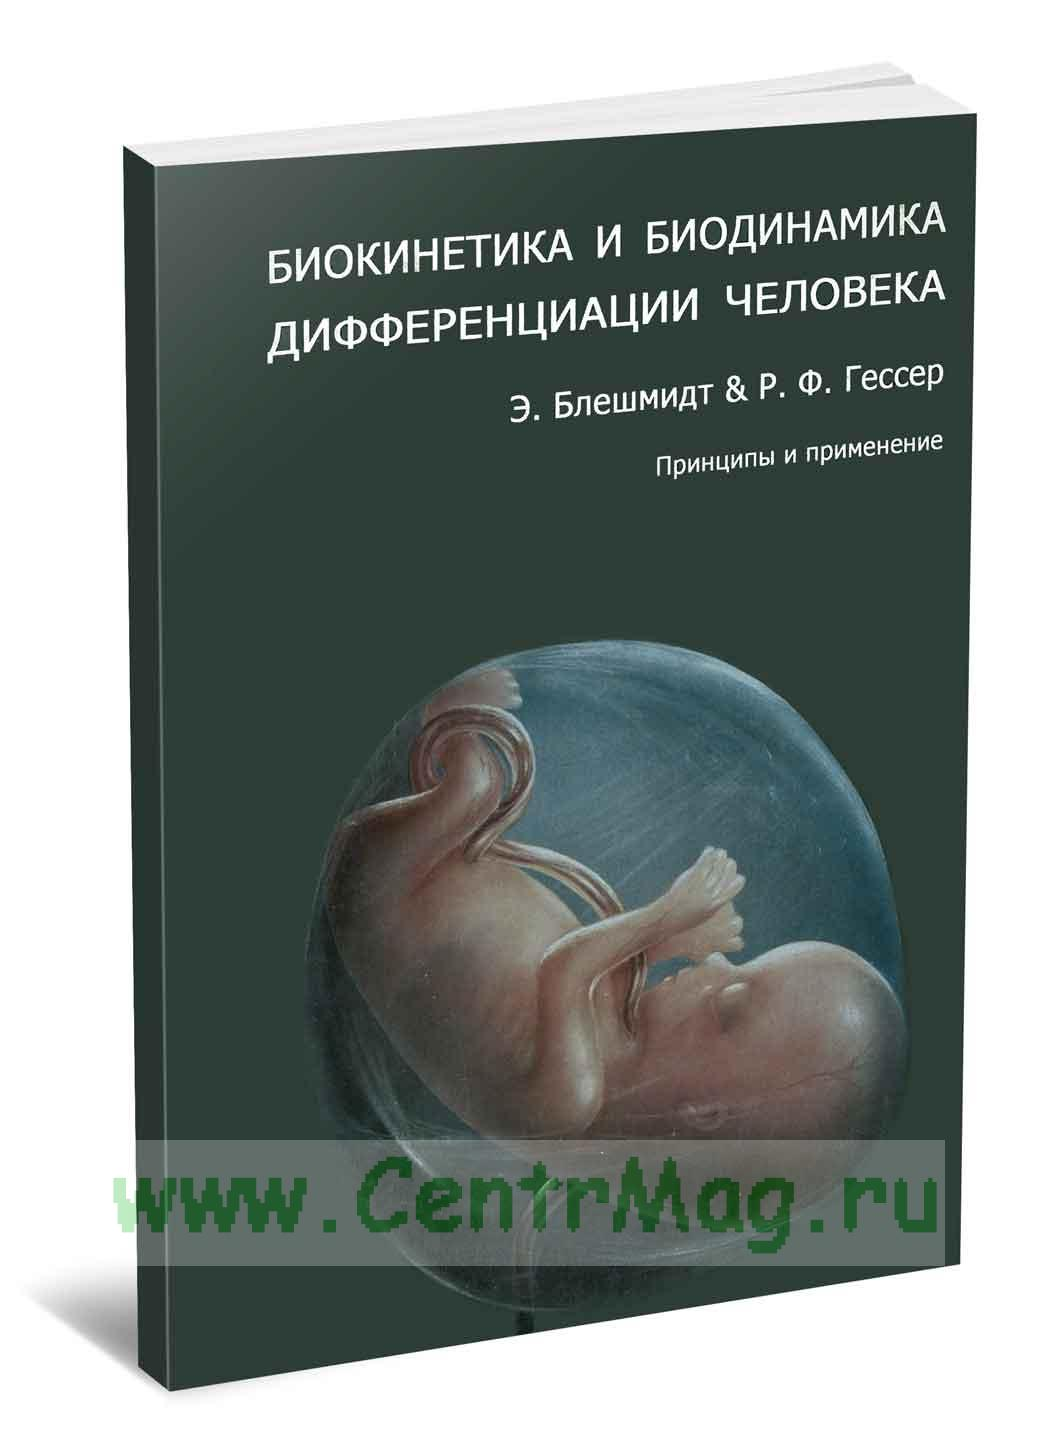 Биокинетика и биодинамика дифференциации человека